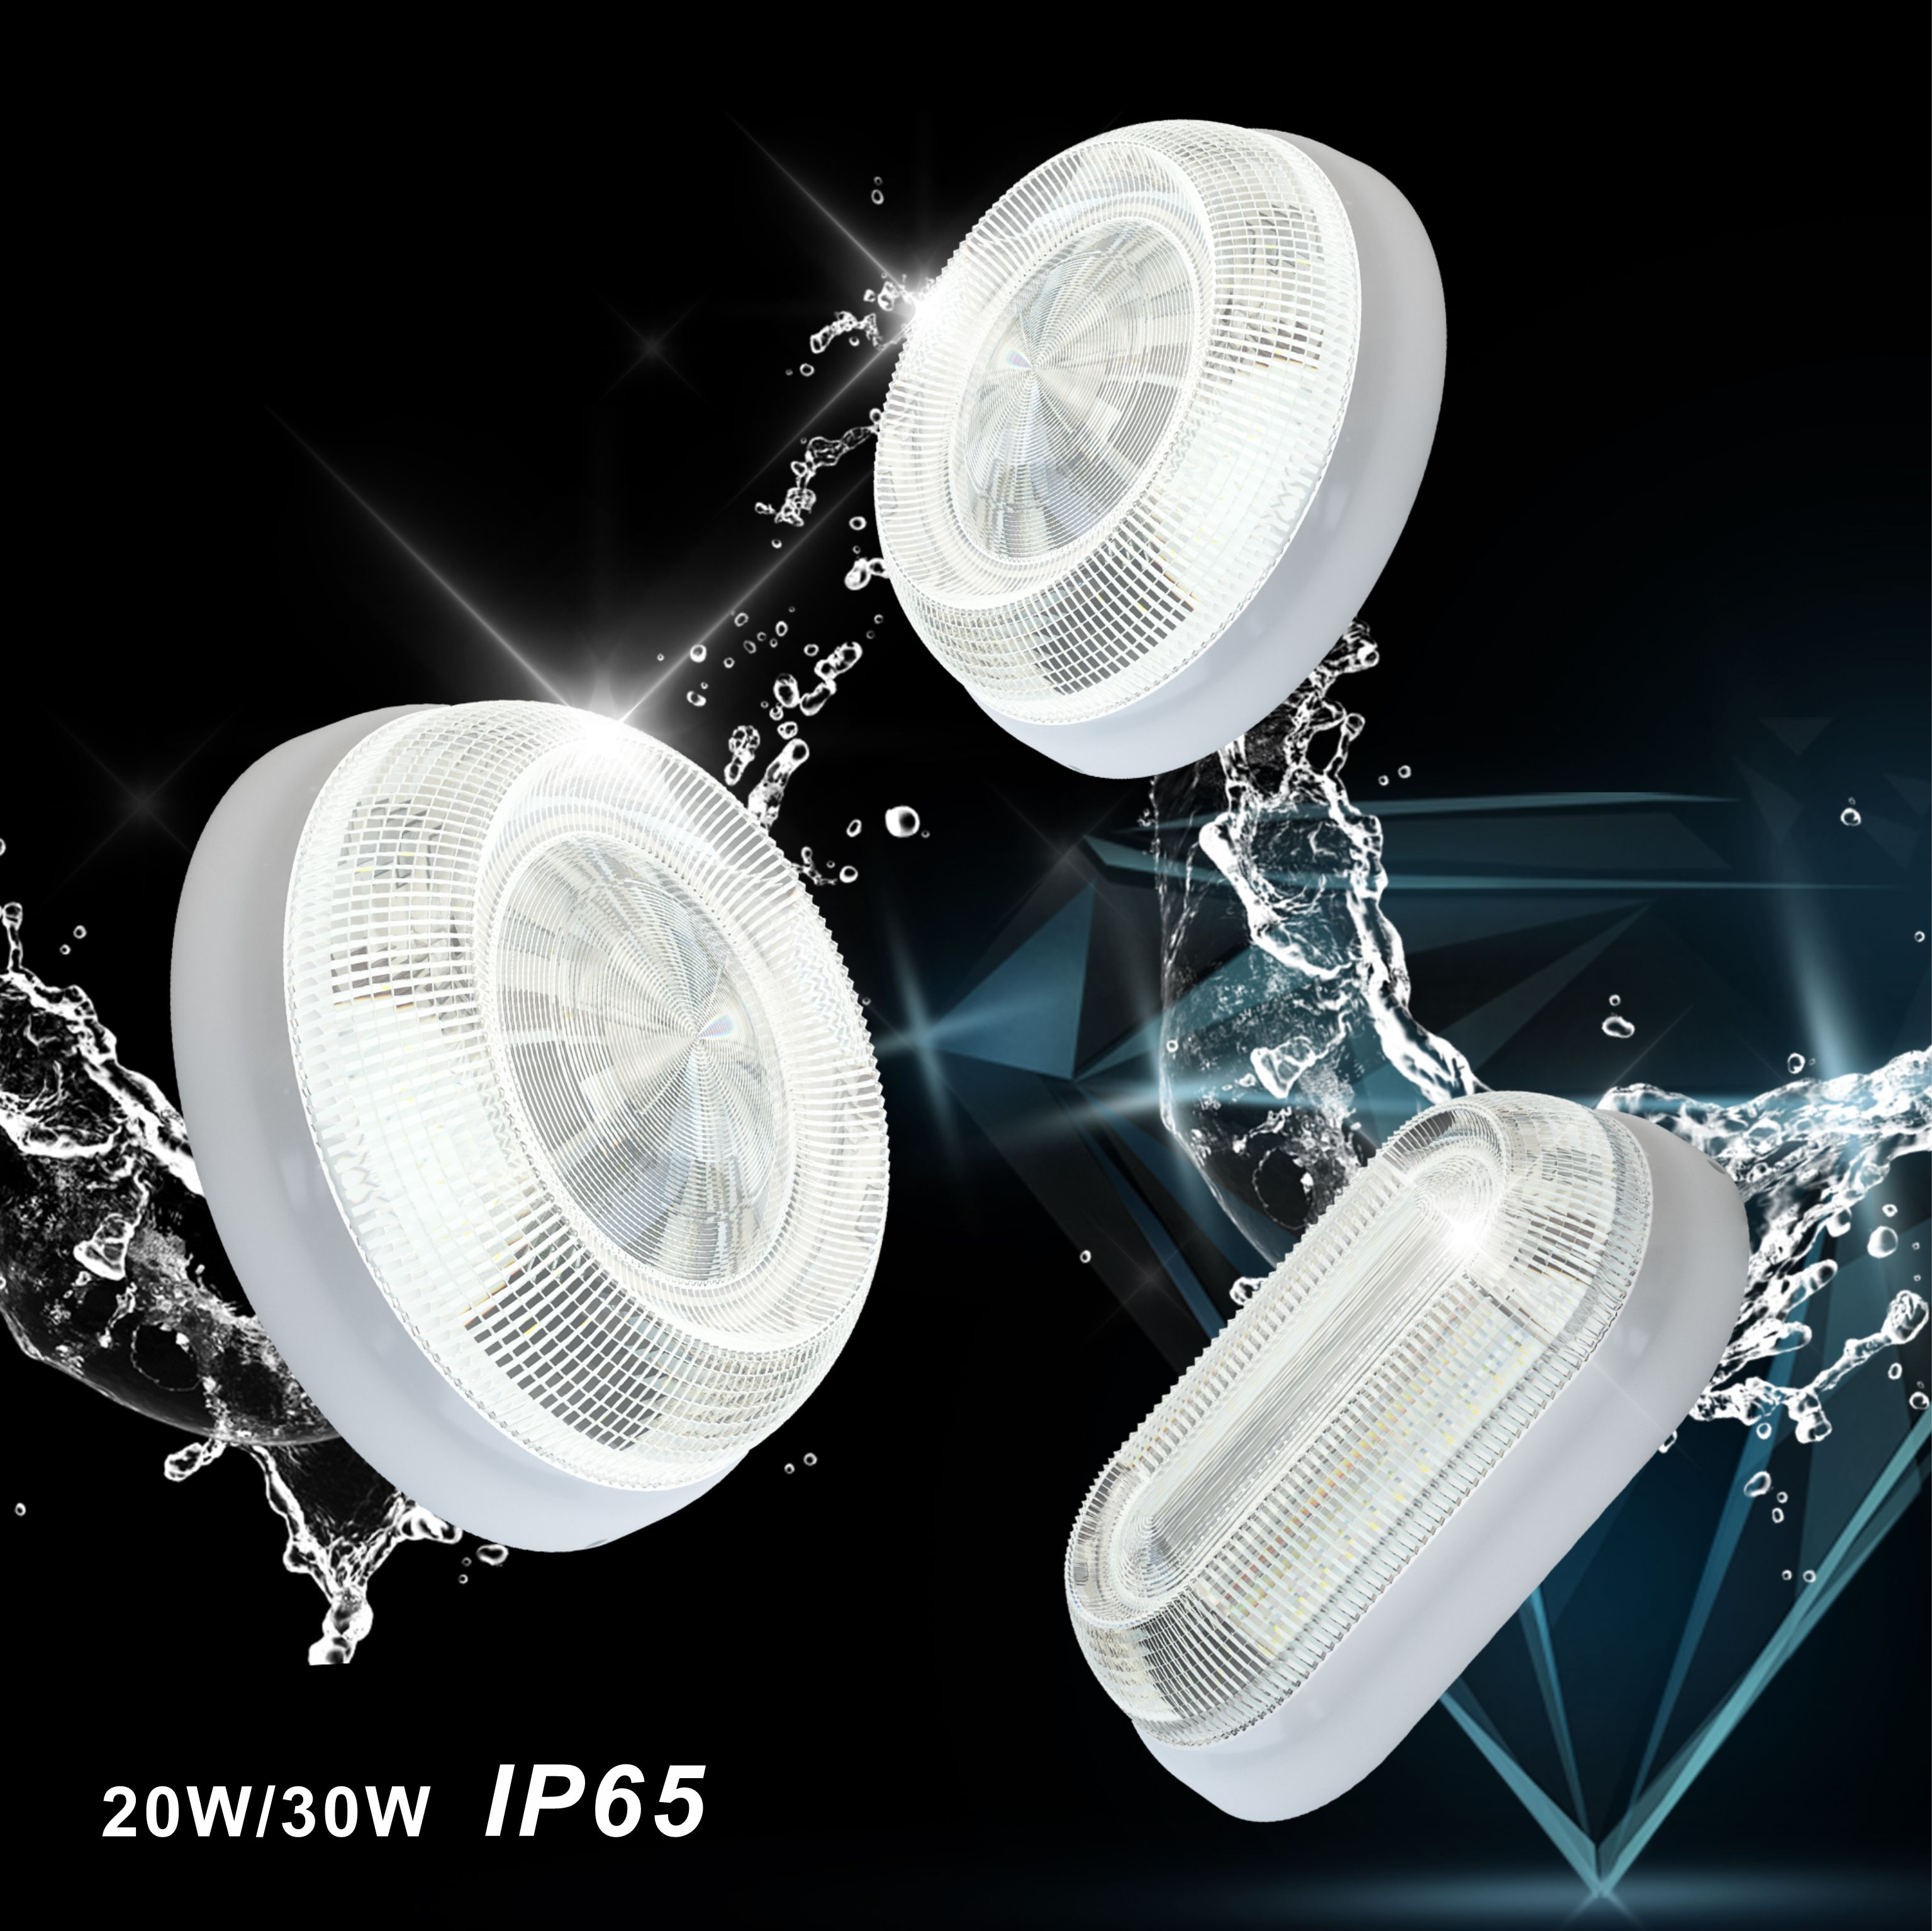 Liper diamond led IP65 downlight